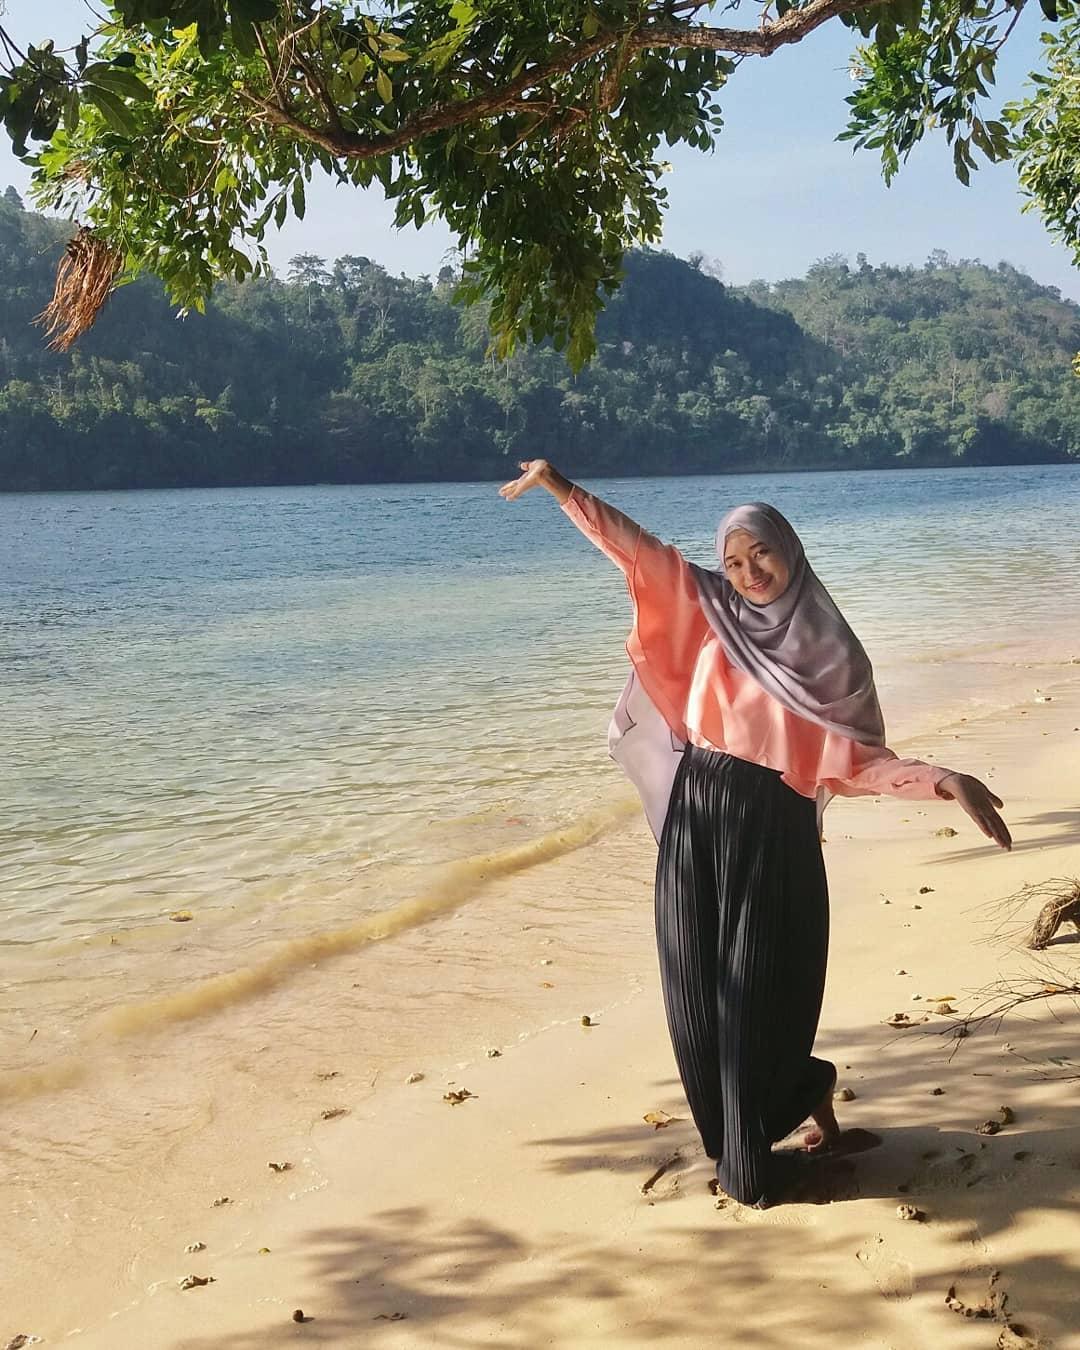 Garis Pantai Pulau Sempu